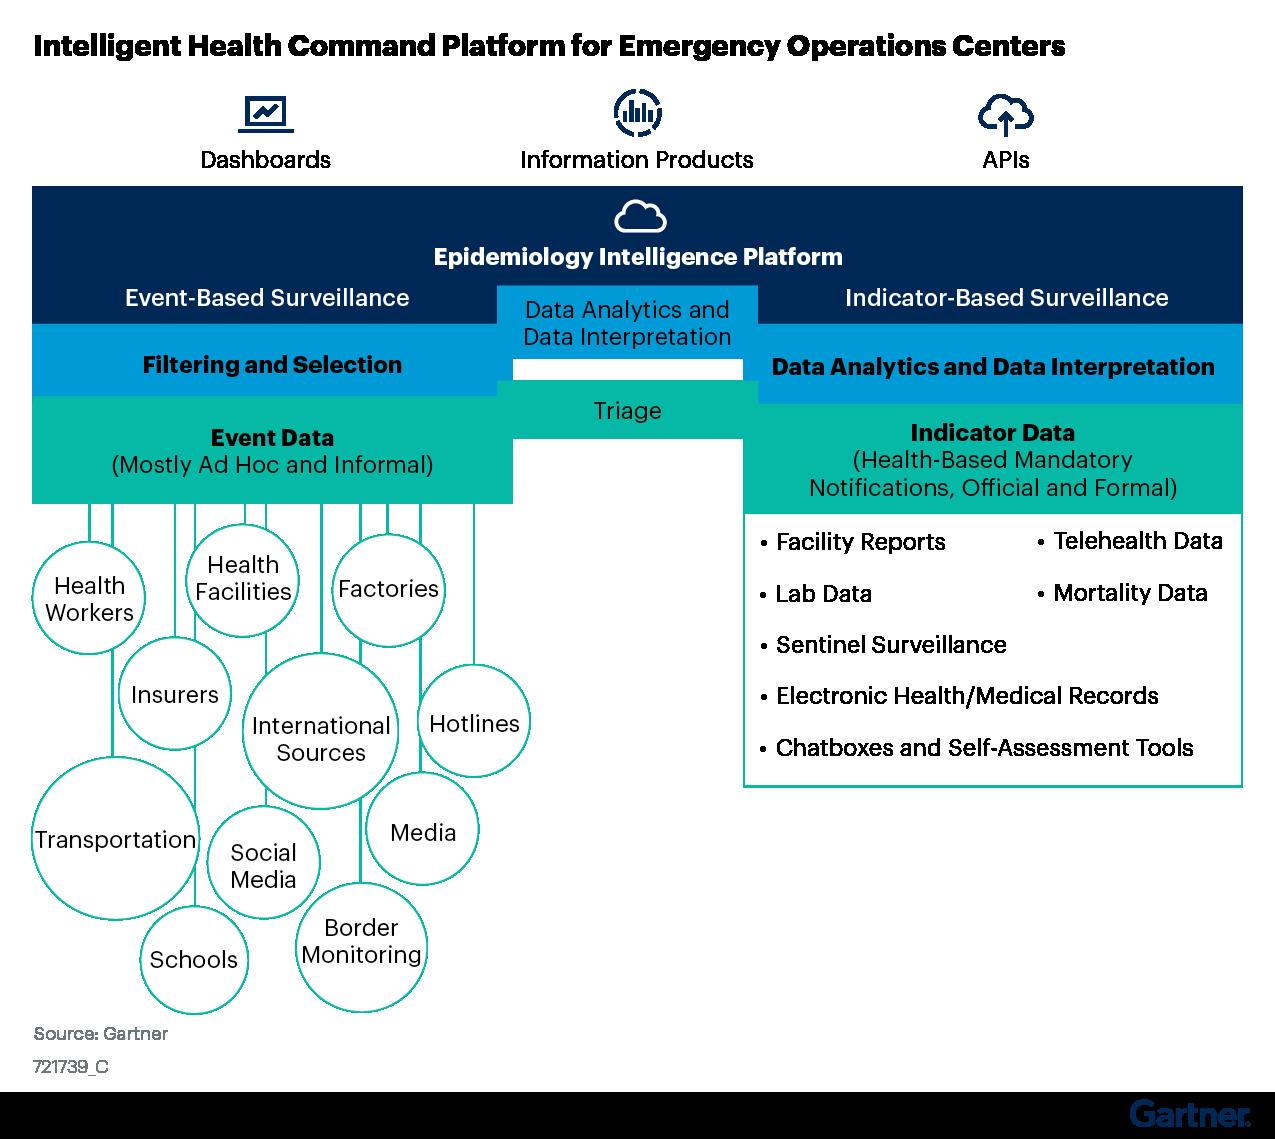 Figure 3: Intelligent Health Command Platform for Emergency Operations Centers